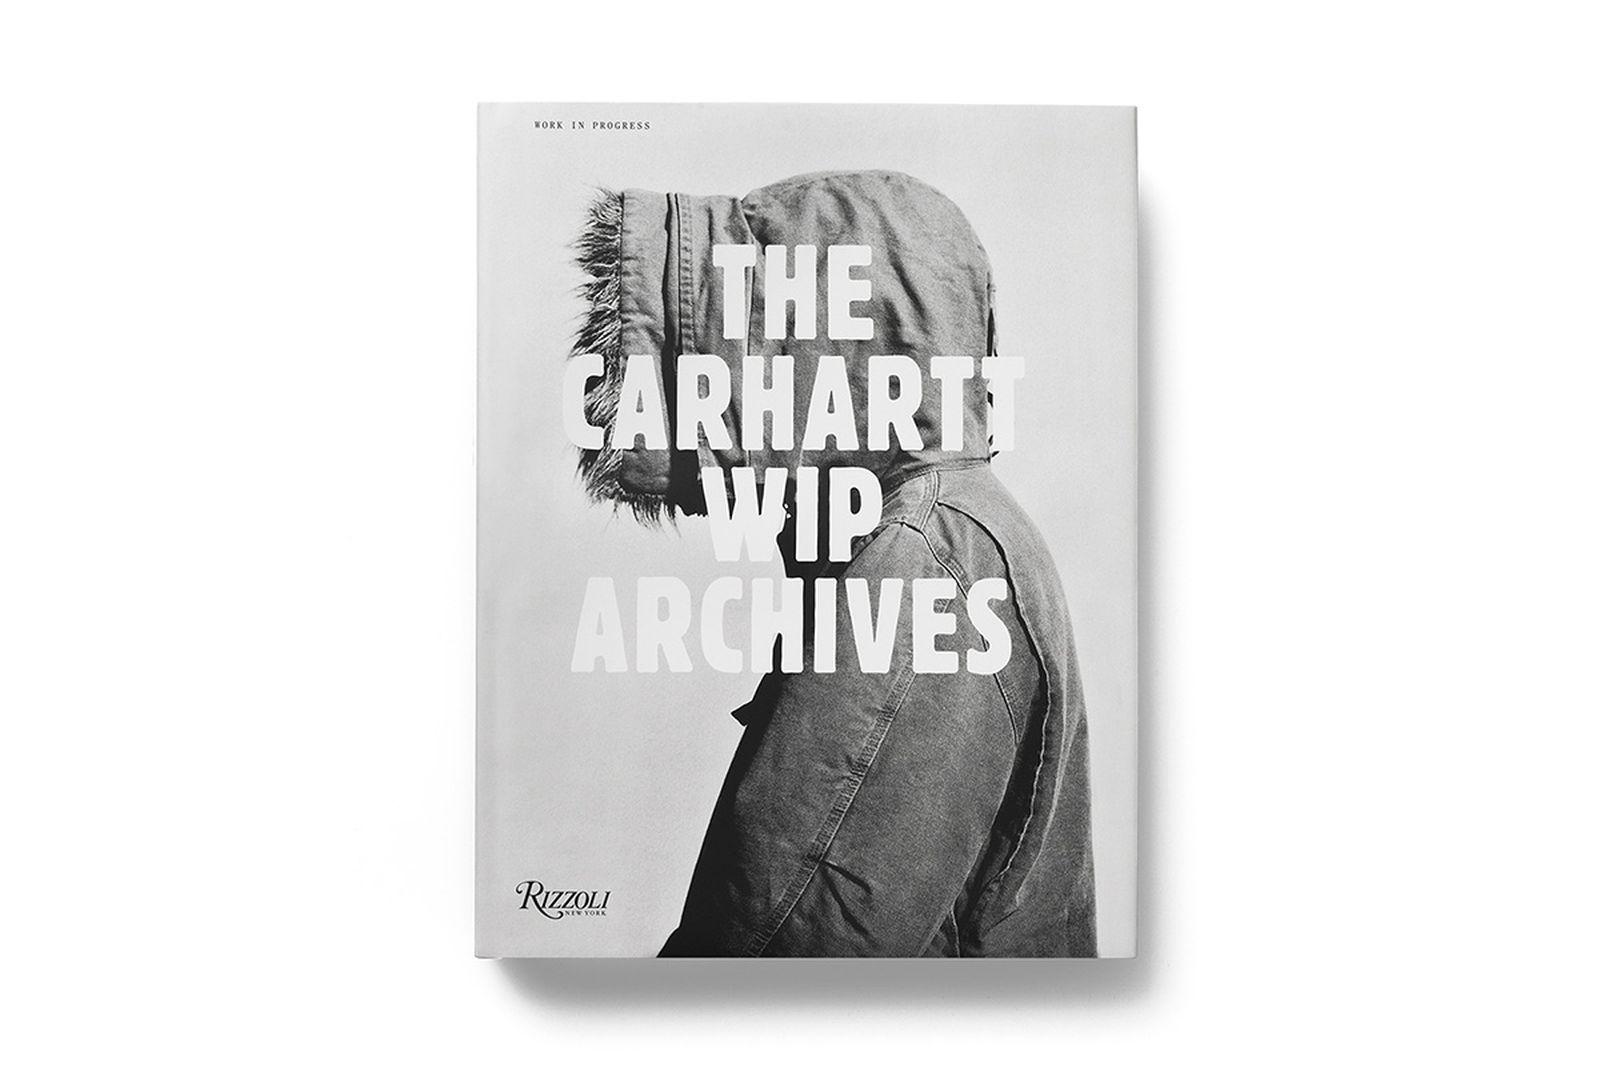 carhartt-wip-archives-streetwear-25-anniversary-10